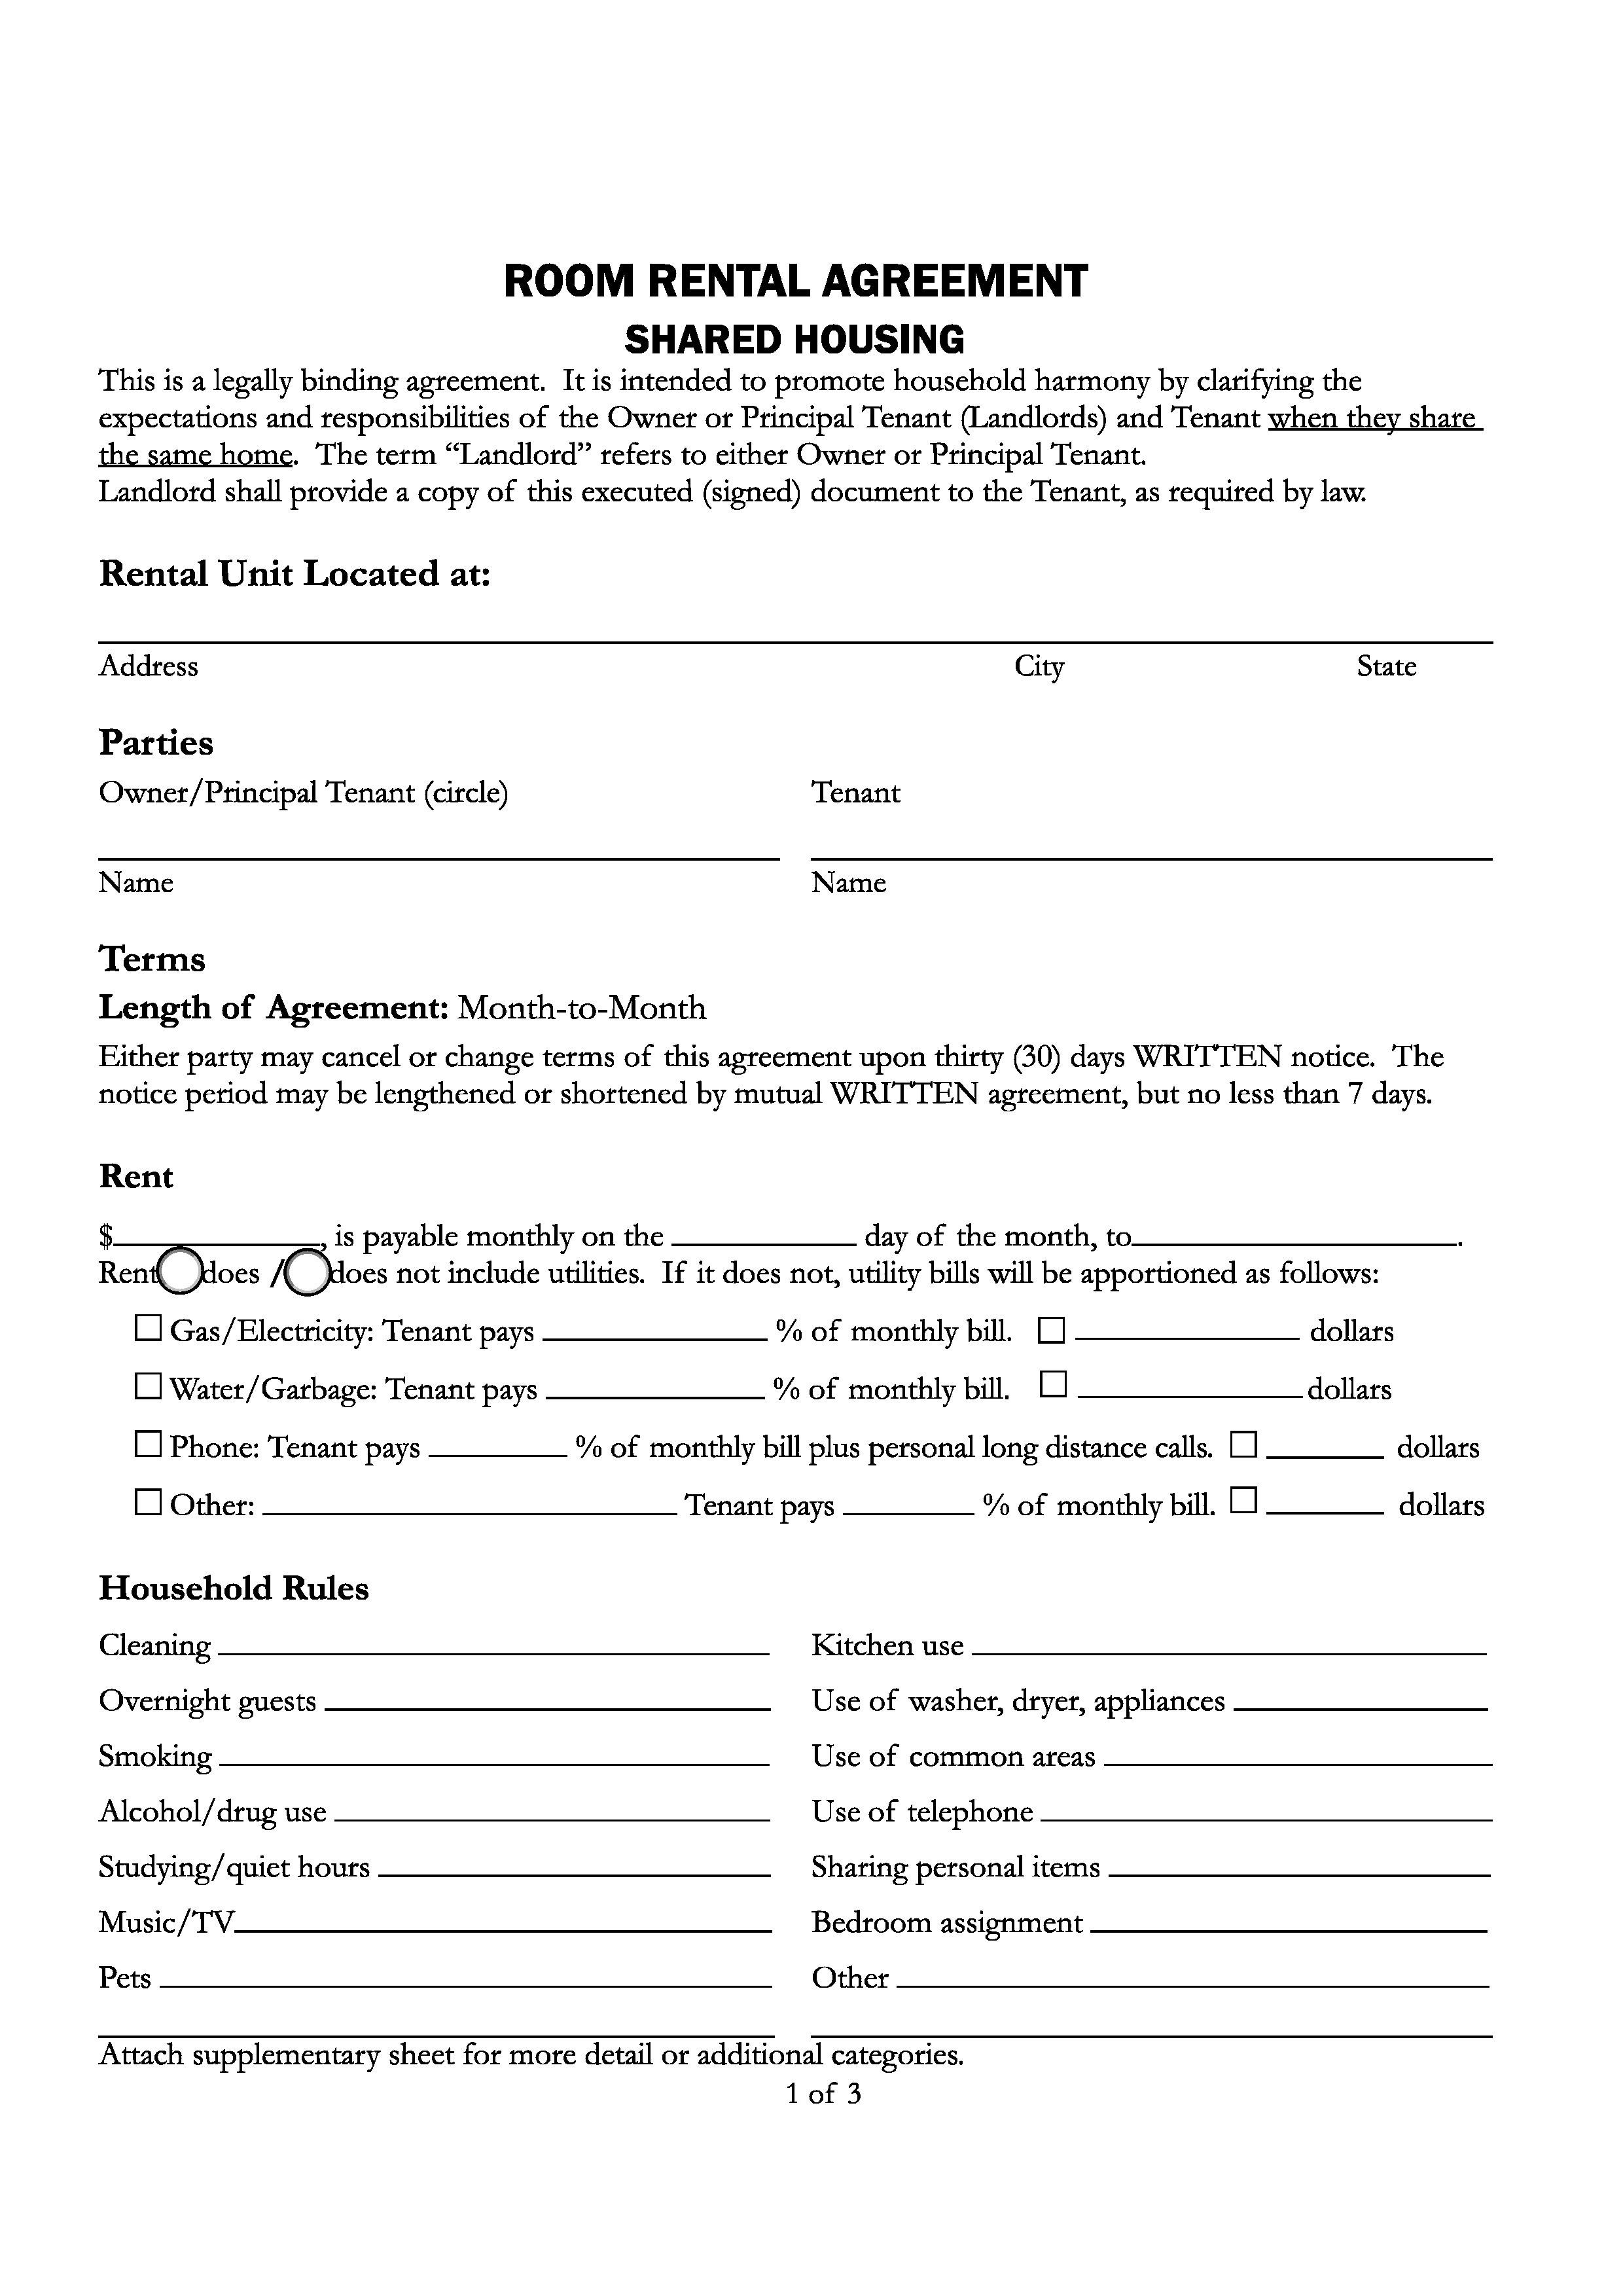 Lease Agreement Form California Pdf Free Santa Cruz County California Room Rental Agreement Pdf Word Do It Yourself Forms